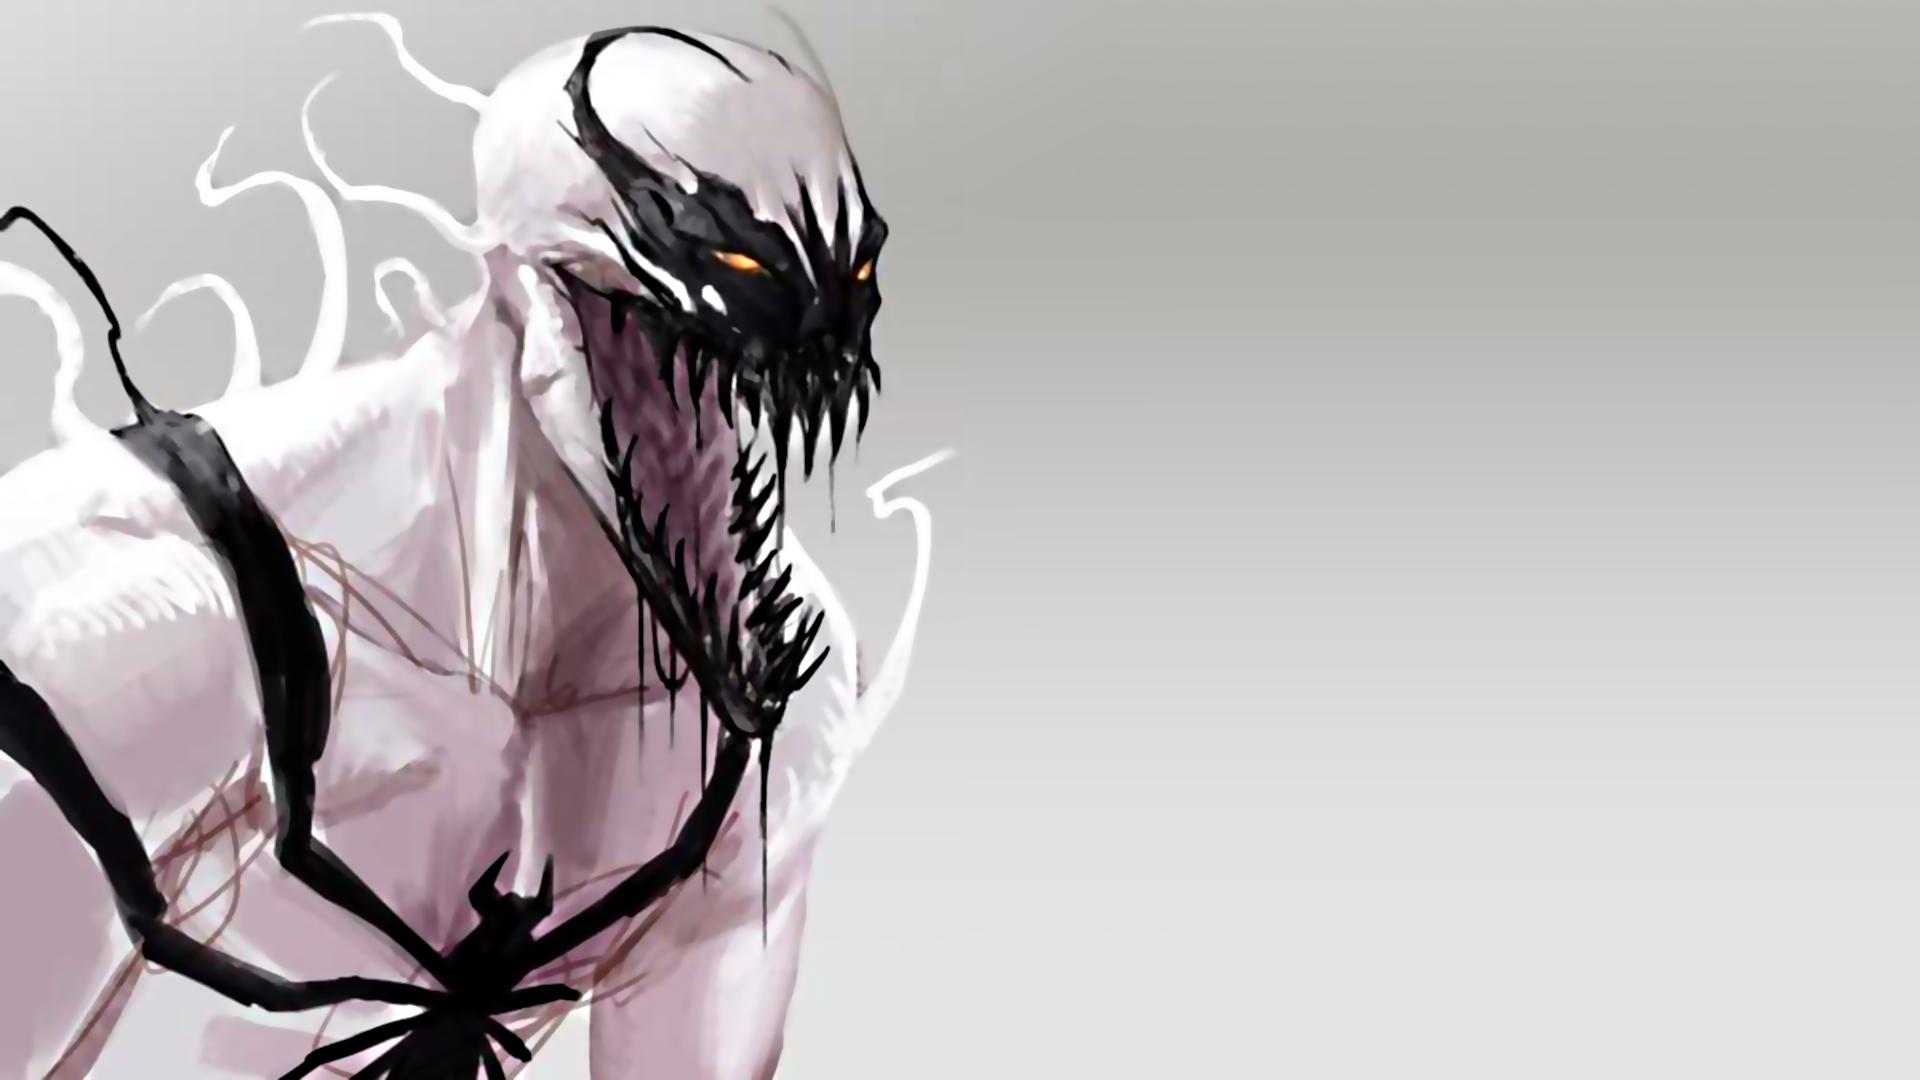 Anti Venom HD Wallpaper by tommospidey.deviantart.com on ...